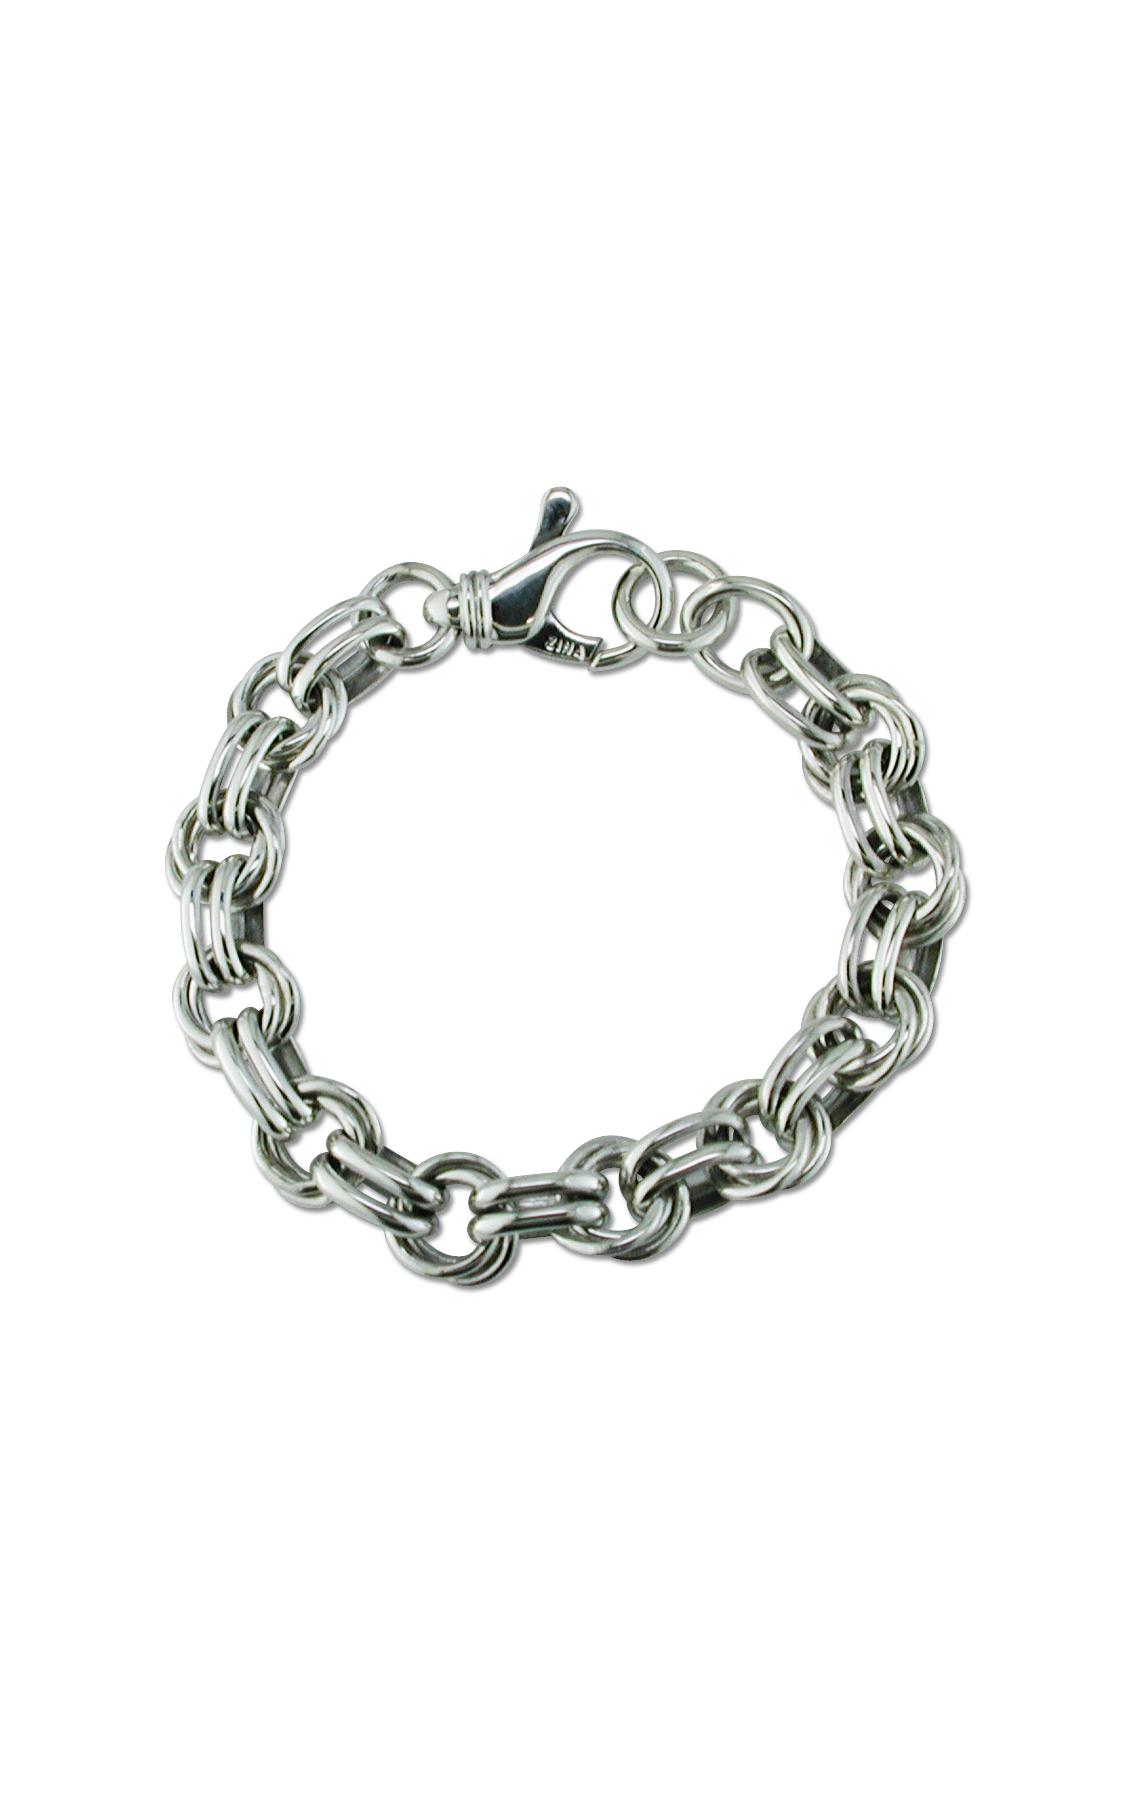 Zina Contemporary Bracelet A651-7 product image